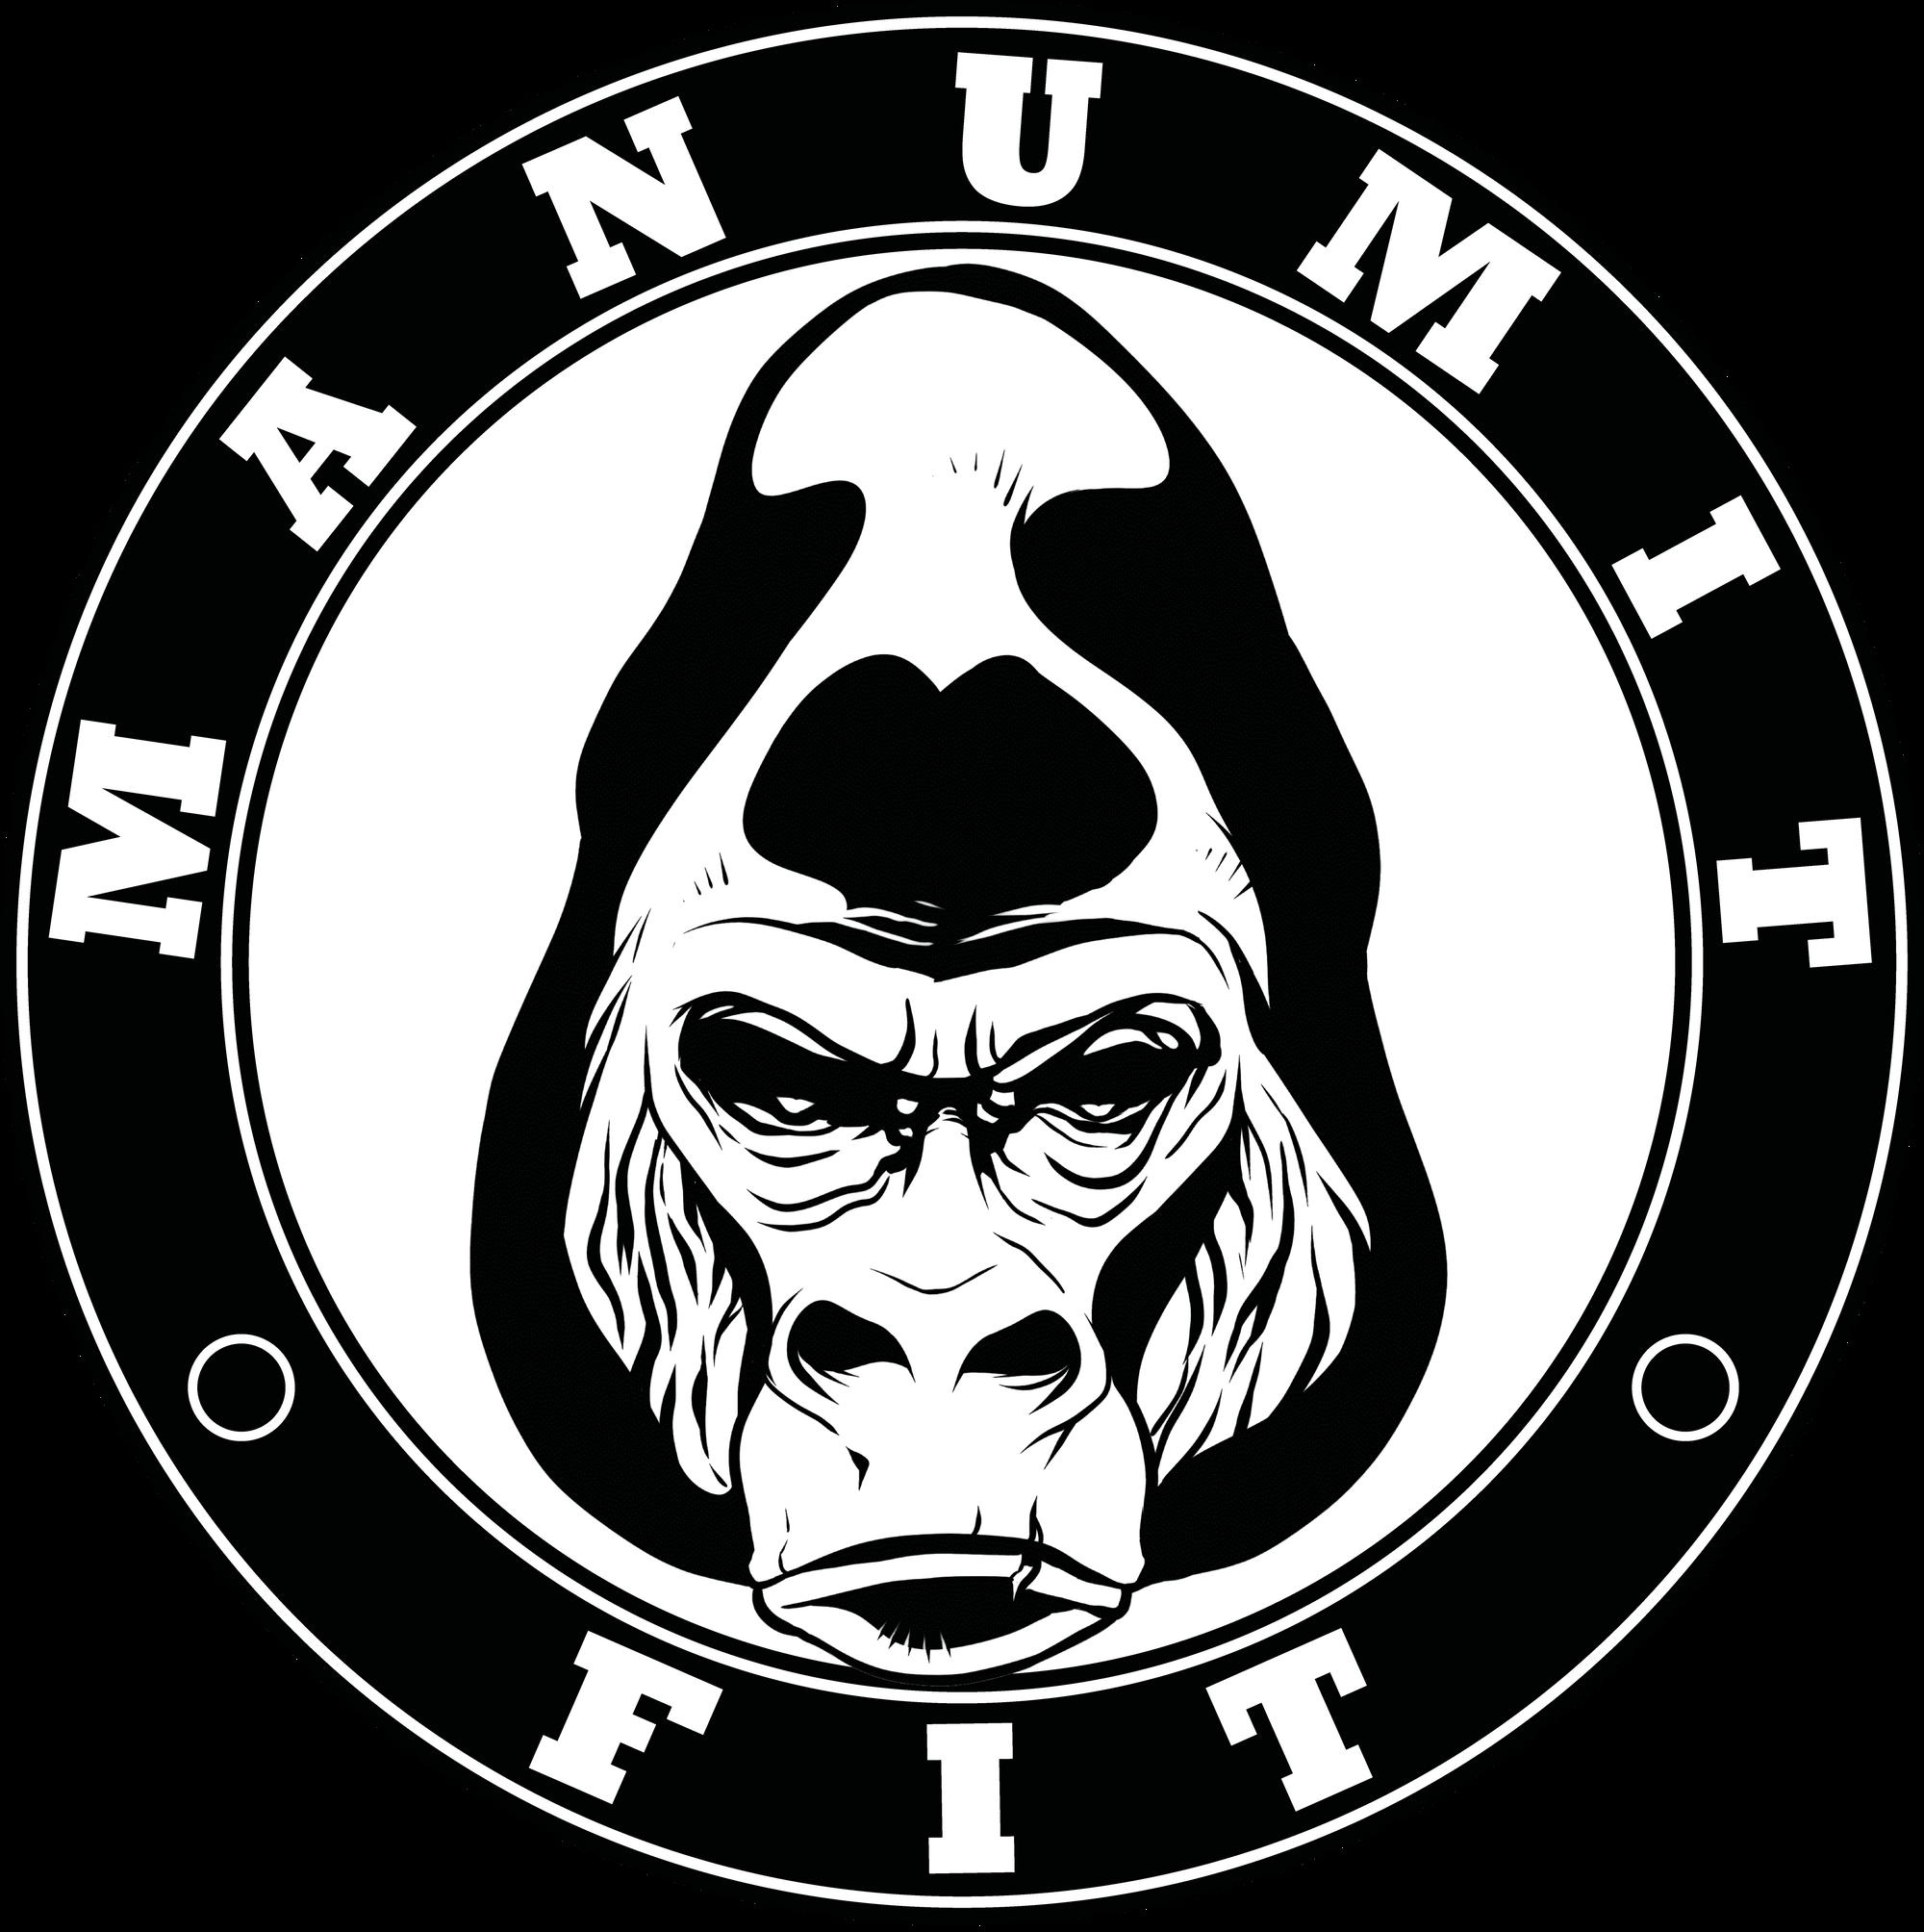 Manumitfit